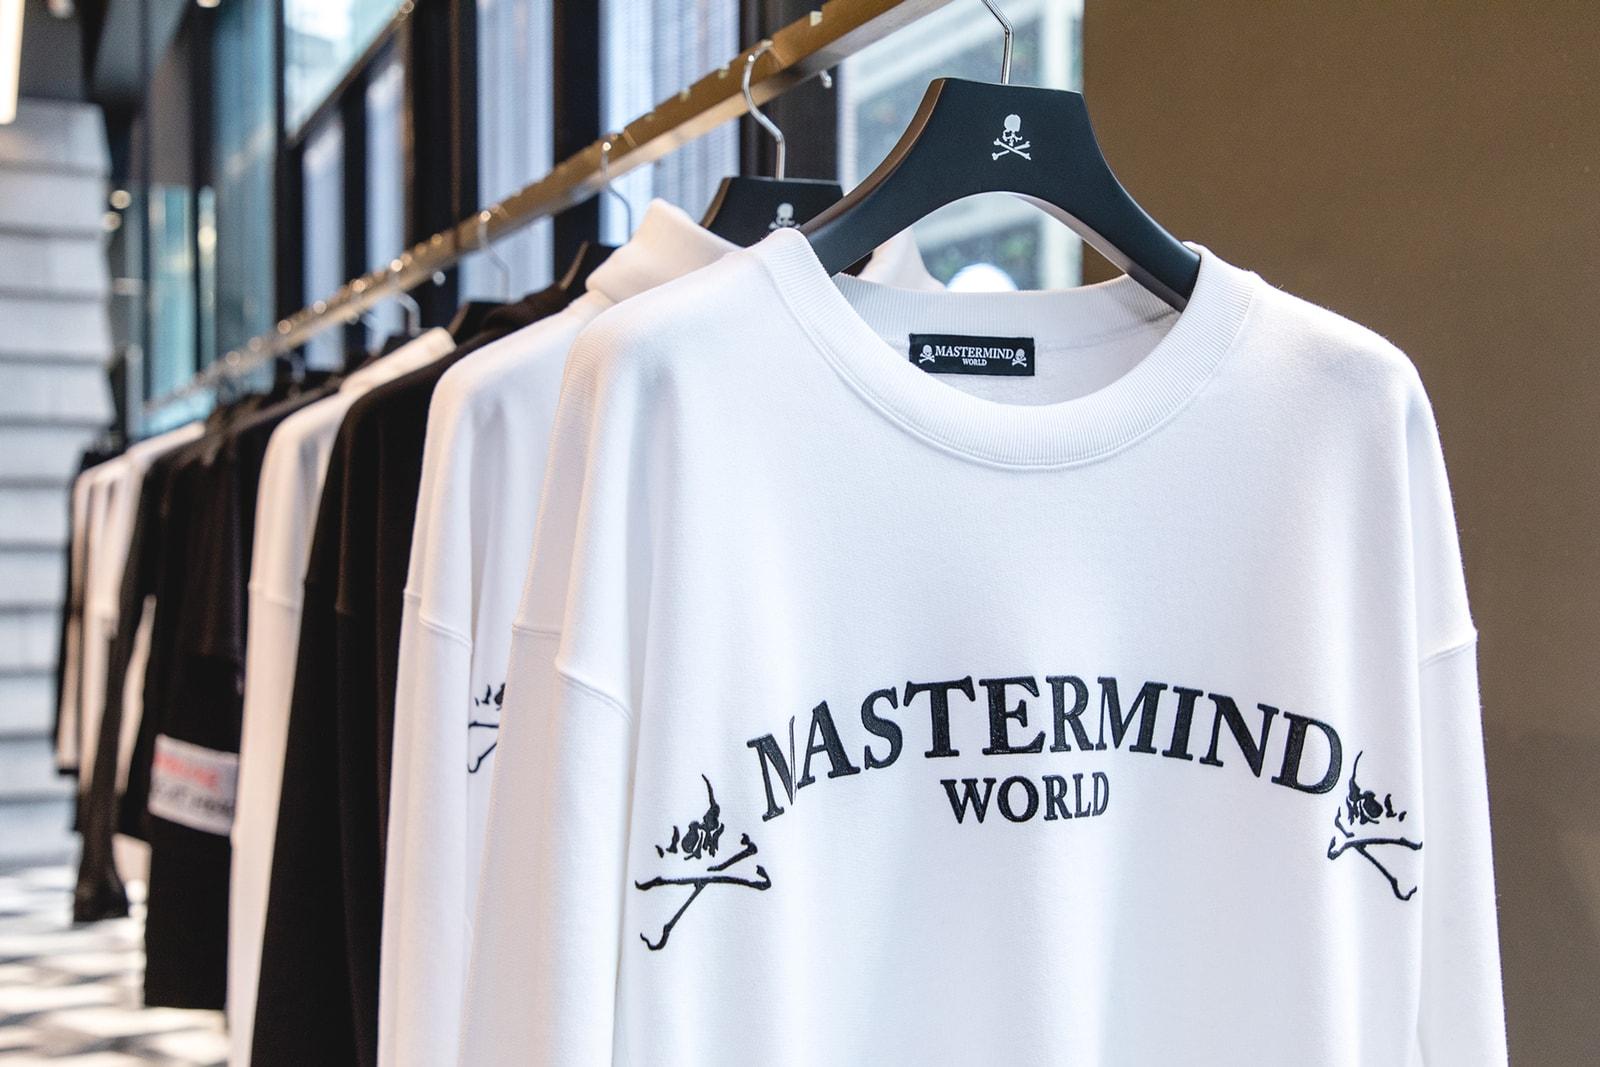 Masaaki Homma mastermind vs BAPE Concept Store Interview Japan World a Bathing Ape Hong Kong I.T Causeway Bay HK Fall Winter 2018 Pop up retail streetwear hypebeast IT Hong Kong Tokyo